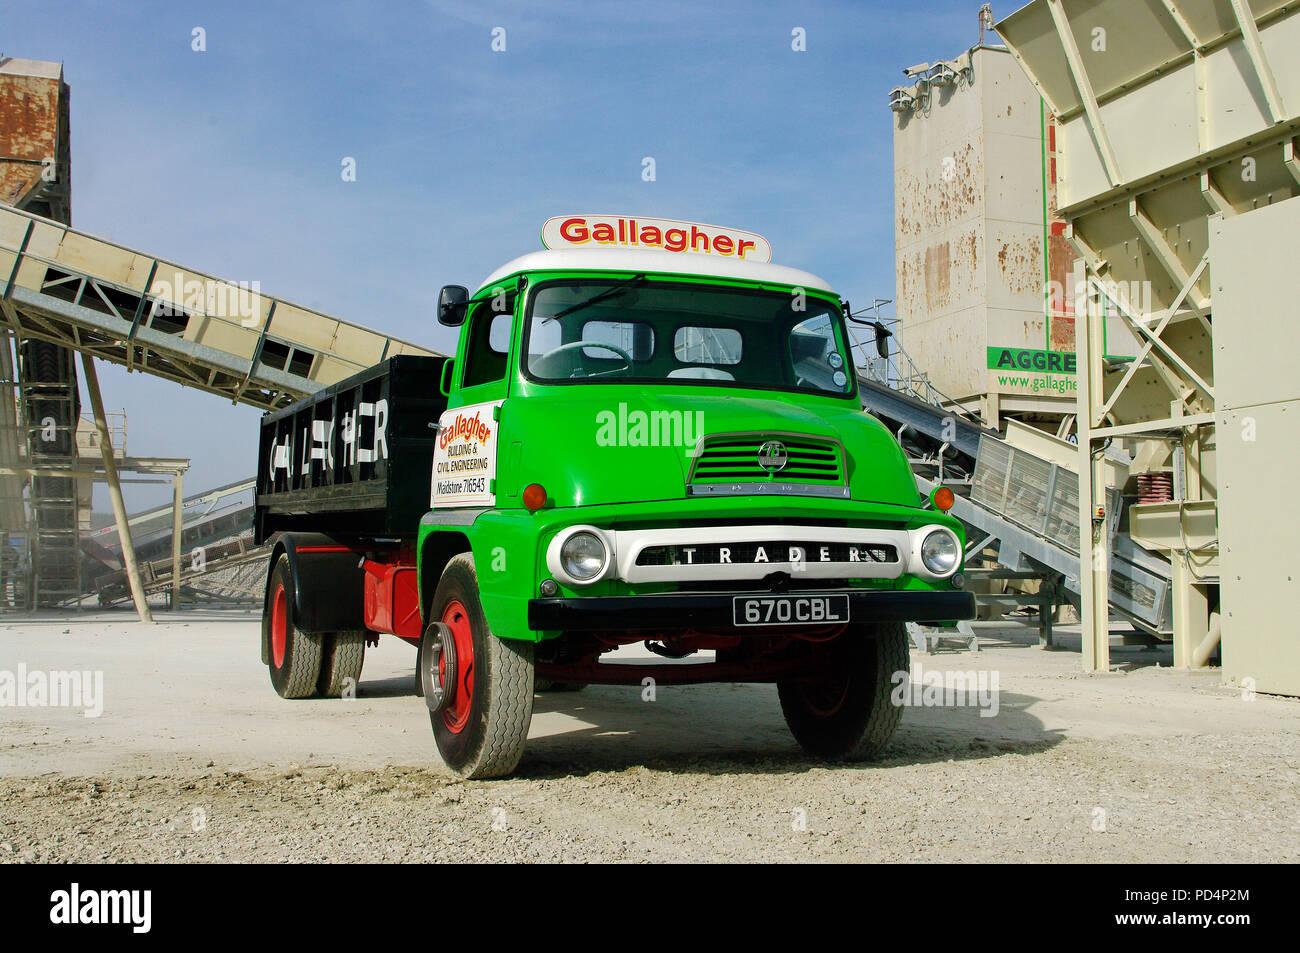 1962 Thames Trader Mkll truck - Stock Image